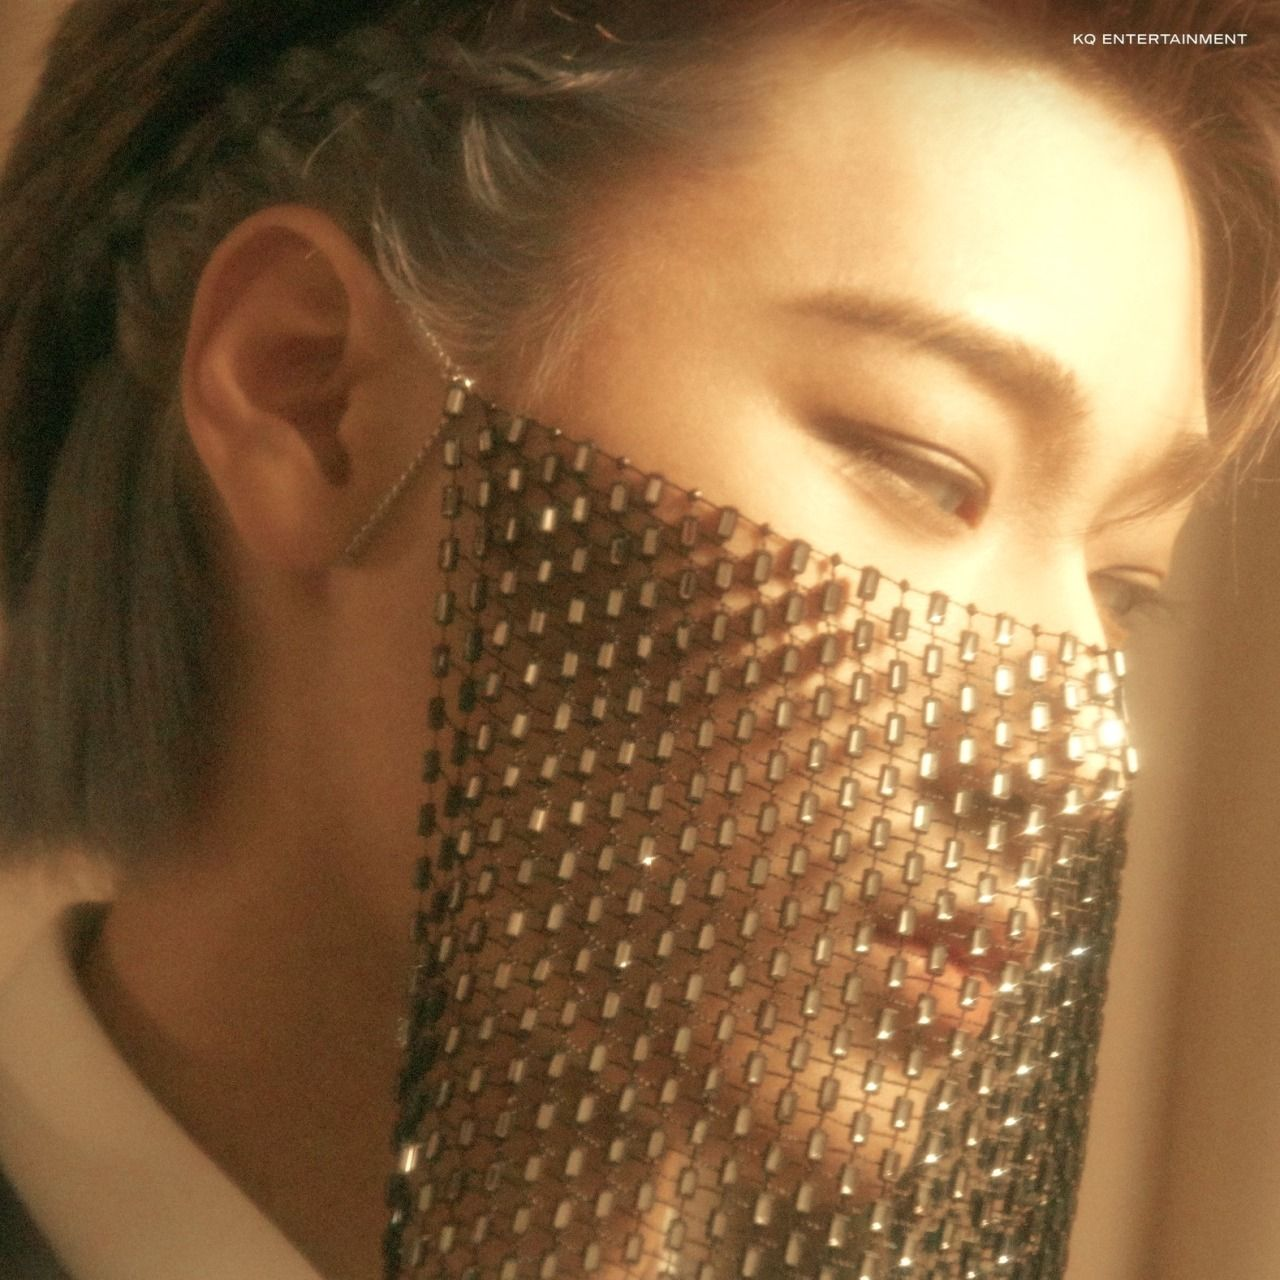 ATEEZ ICONS Icon, Kpop, Kpop idol